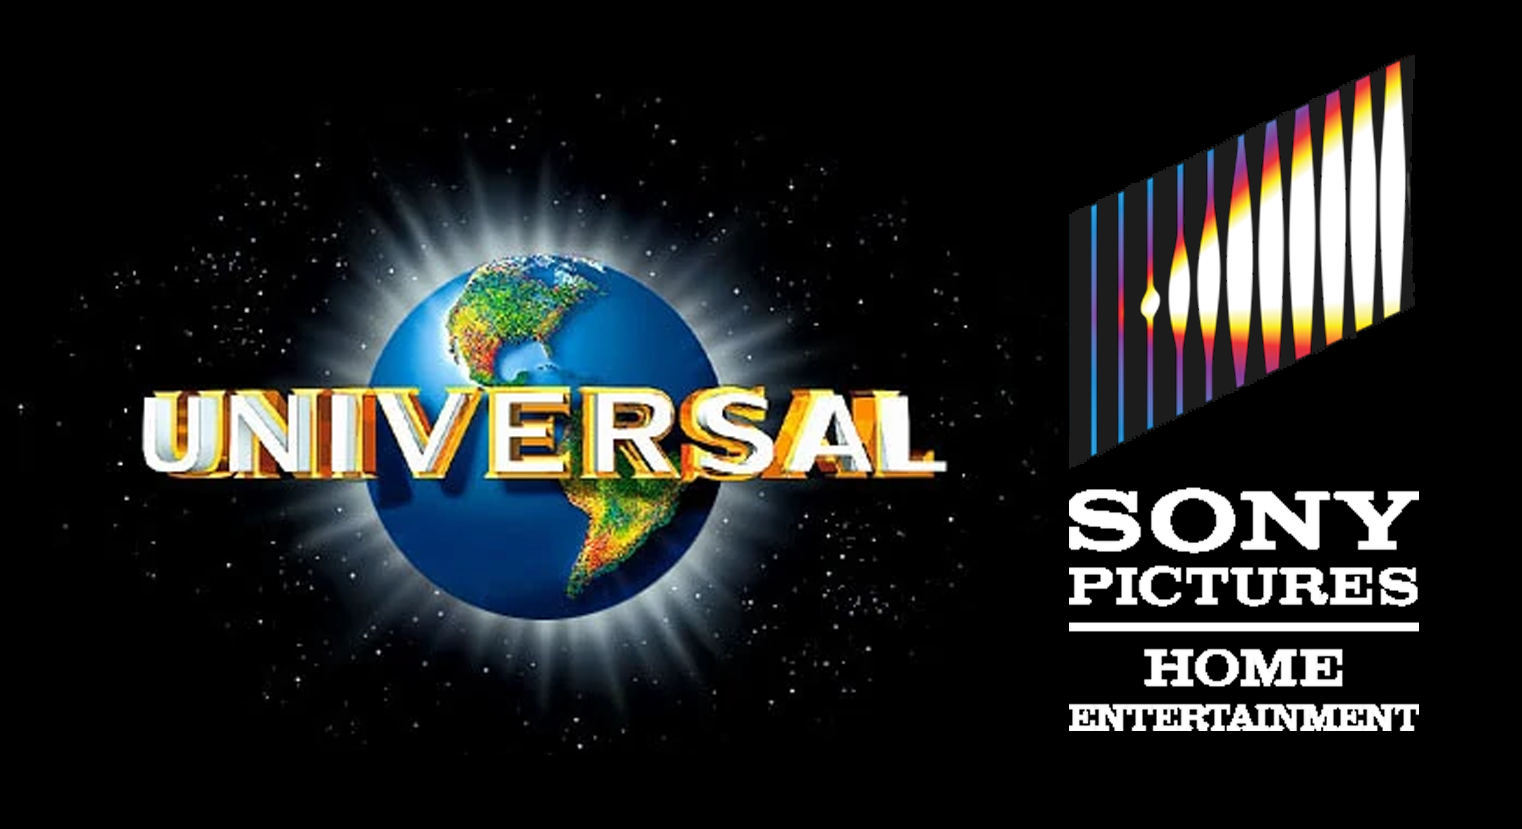 Universal Sony Pictures Home Entertainment Logo By Cartoonanimefan2000 On Deviantart